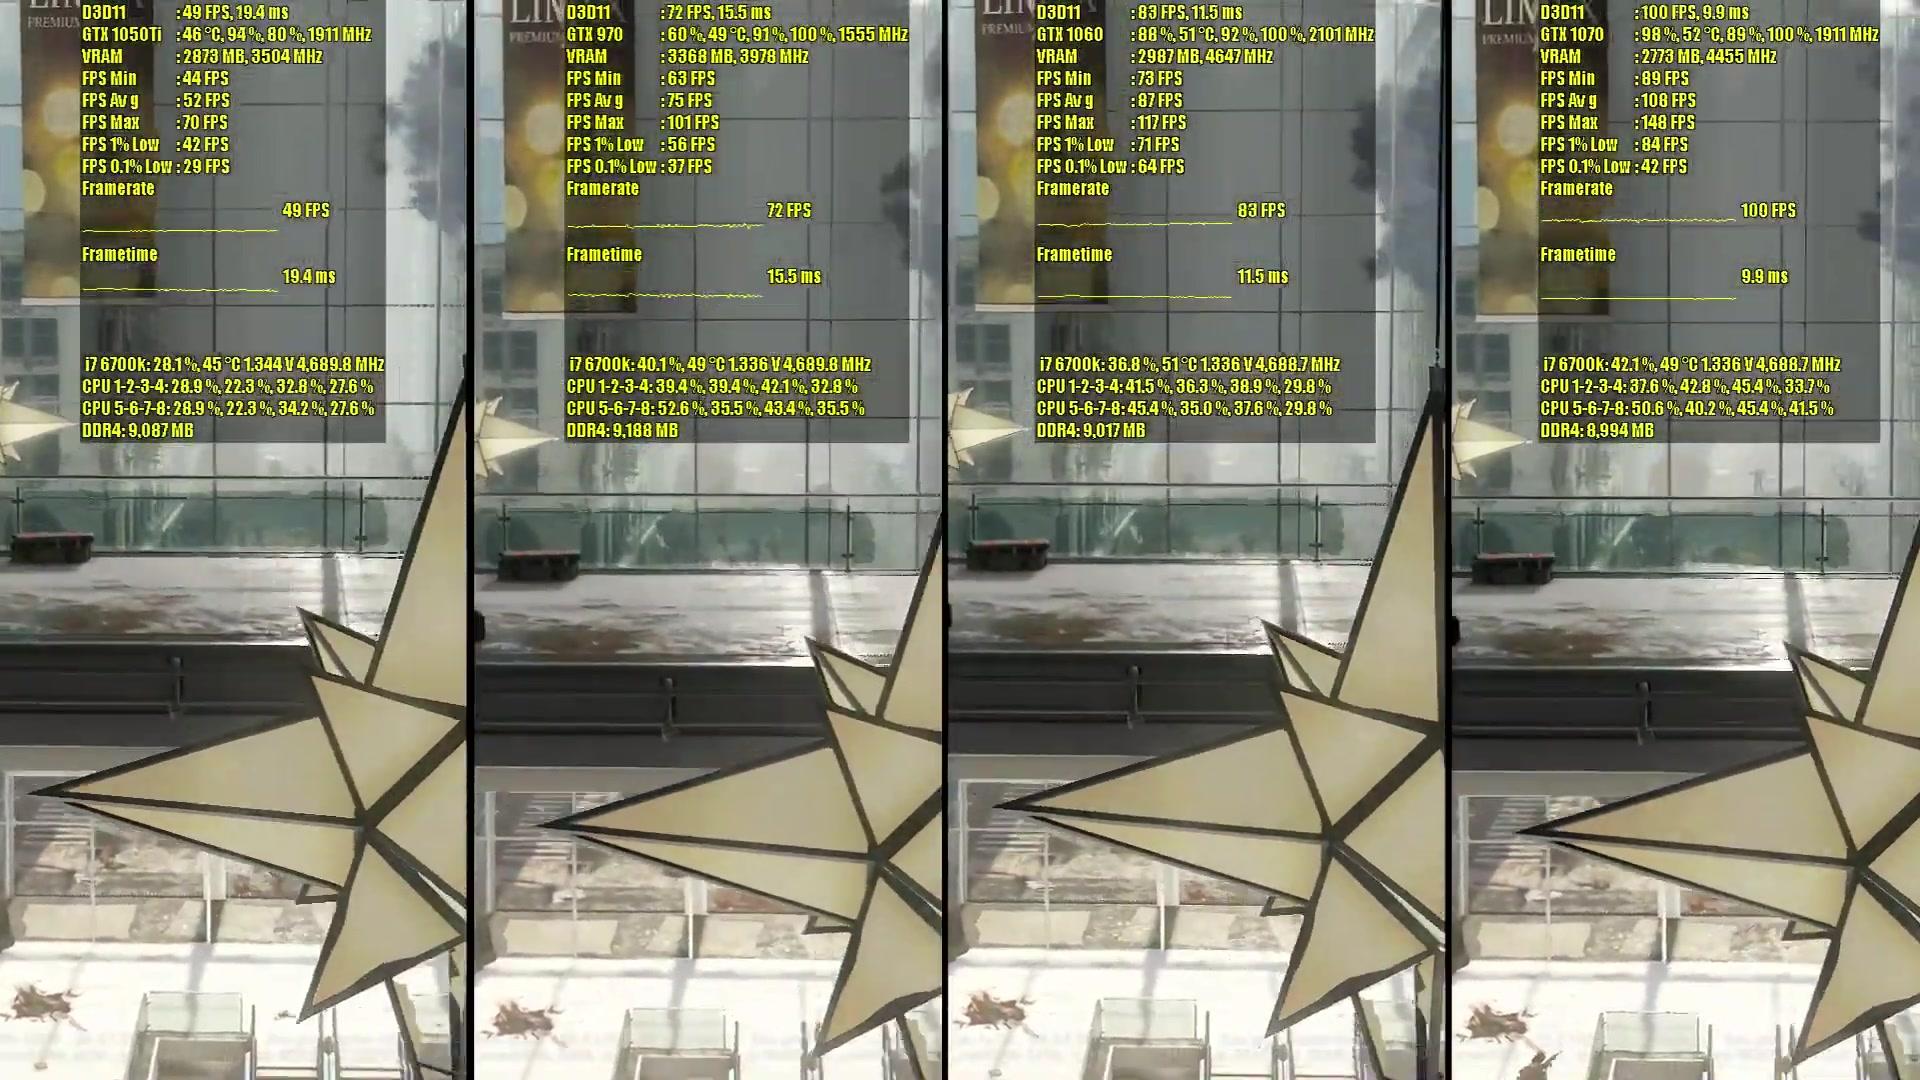 GTX 1050 Ti vs GTX 970 vs GTX 1060 vs GTX 1070 《僵尸世界大战》性能